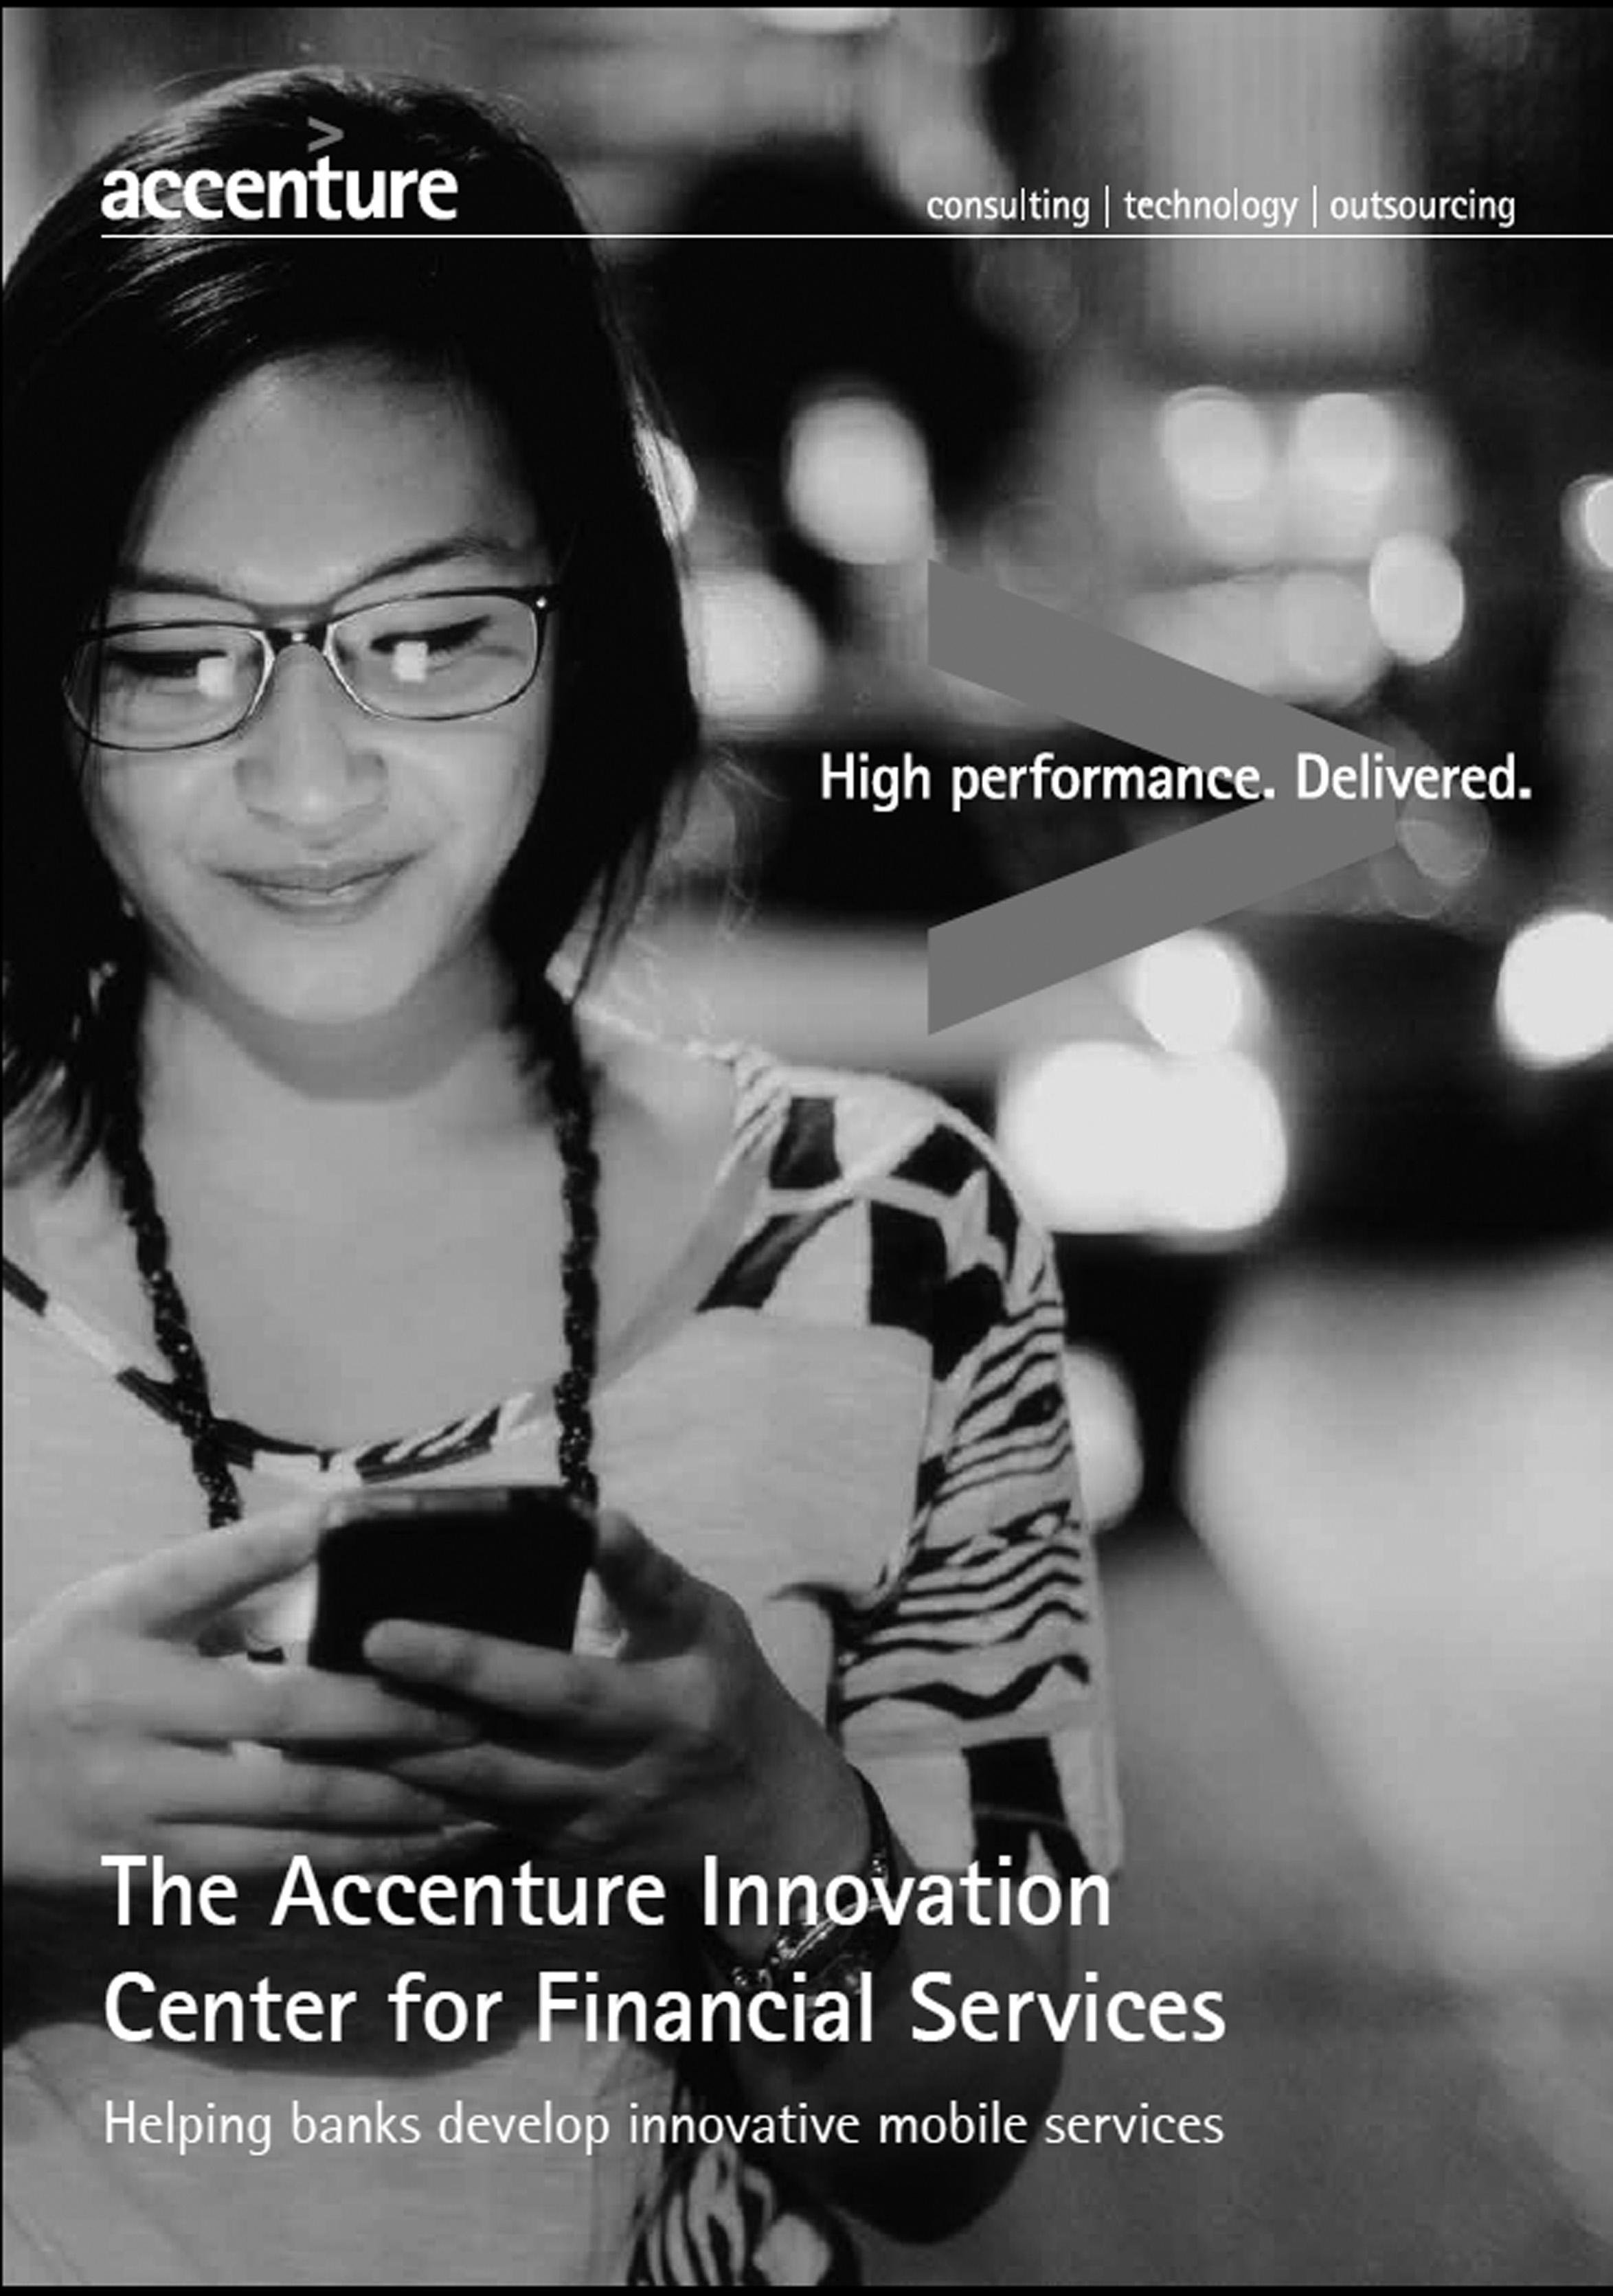 Verra Accenture Jakarta copy.jpg